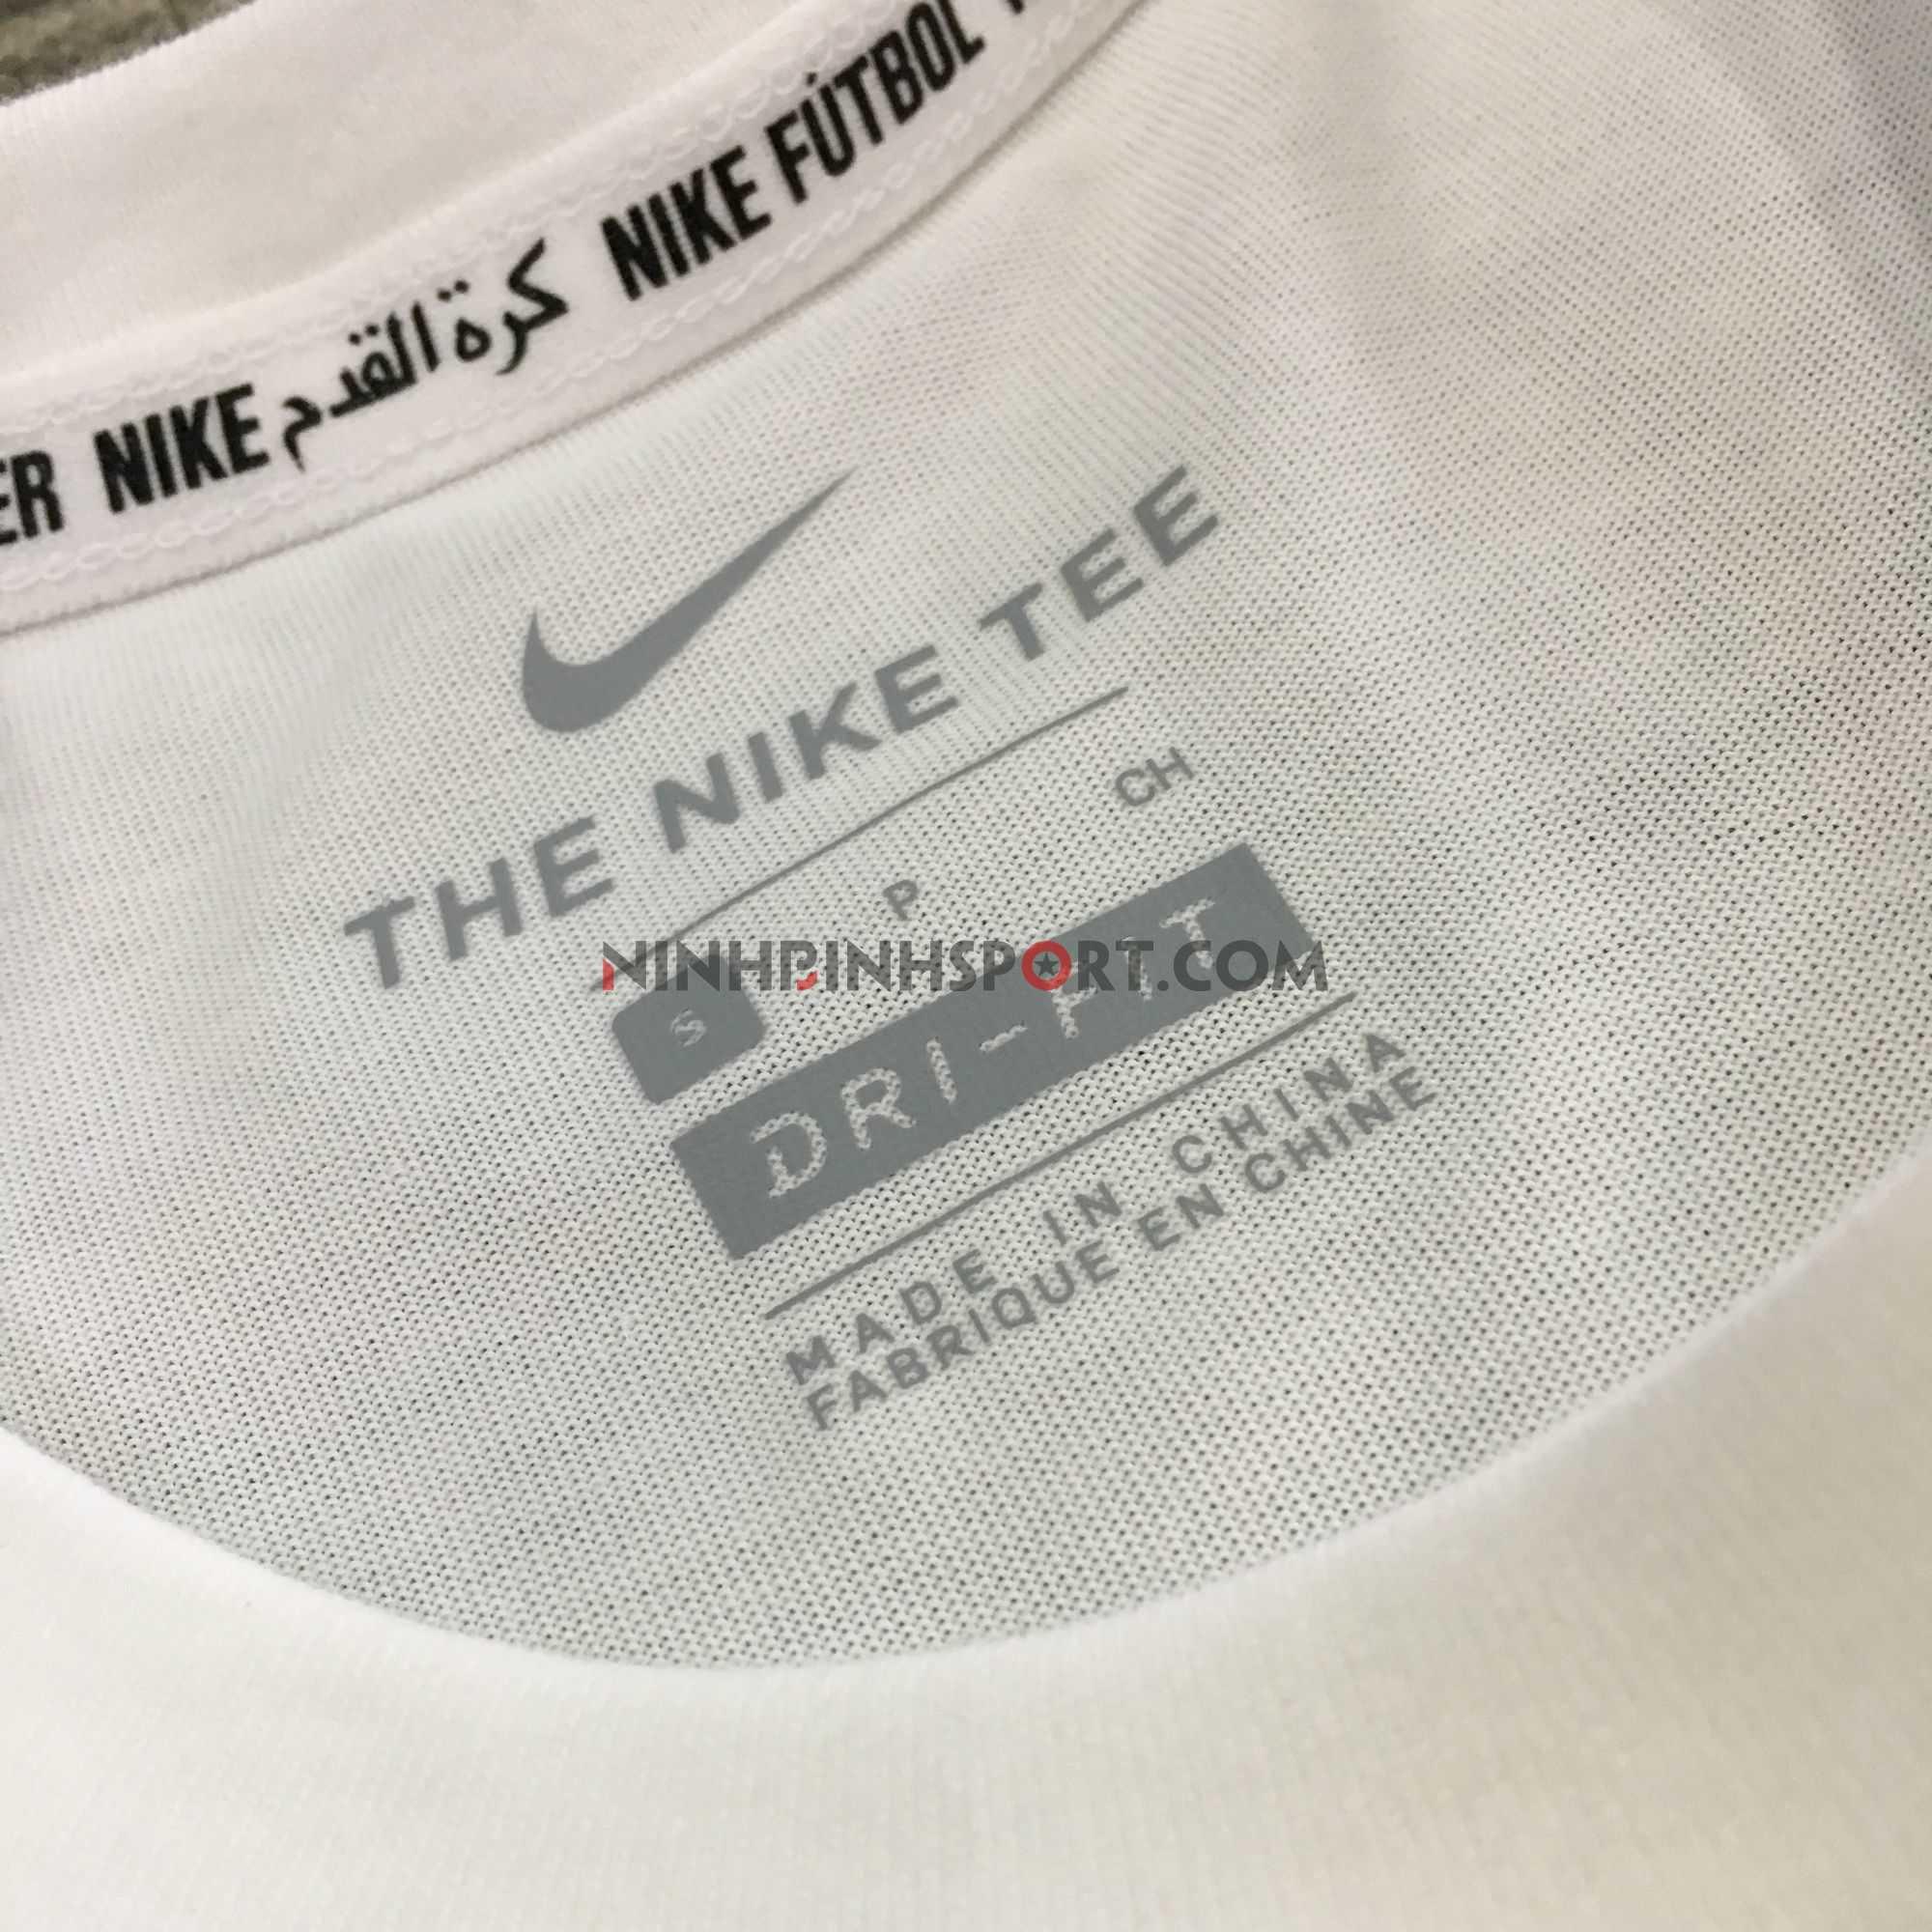 Áo thể thao nam Nike FC Dri-Fit Tee White  AJ7414-100